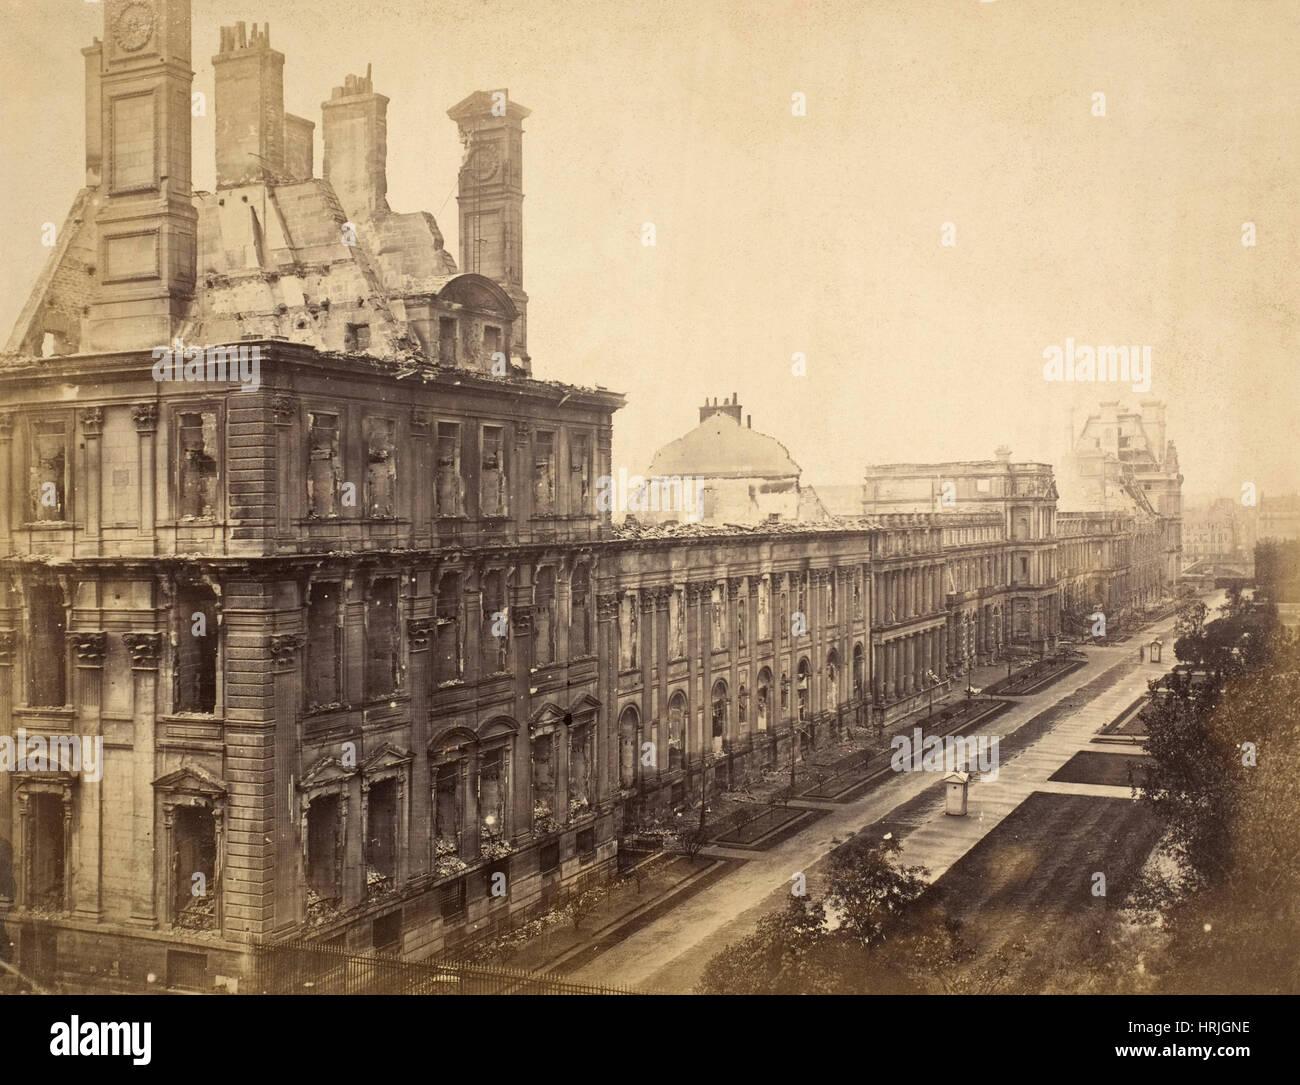 Paris Commune, Destroyed Tuileries Palace, 1871 - Stock Image